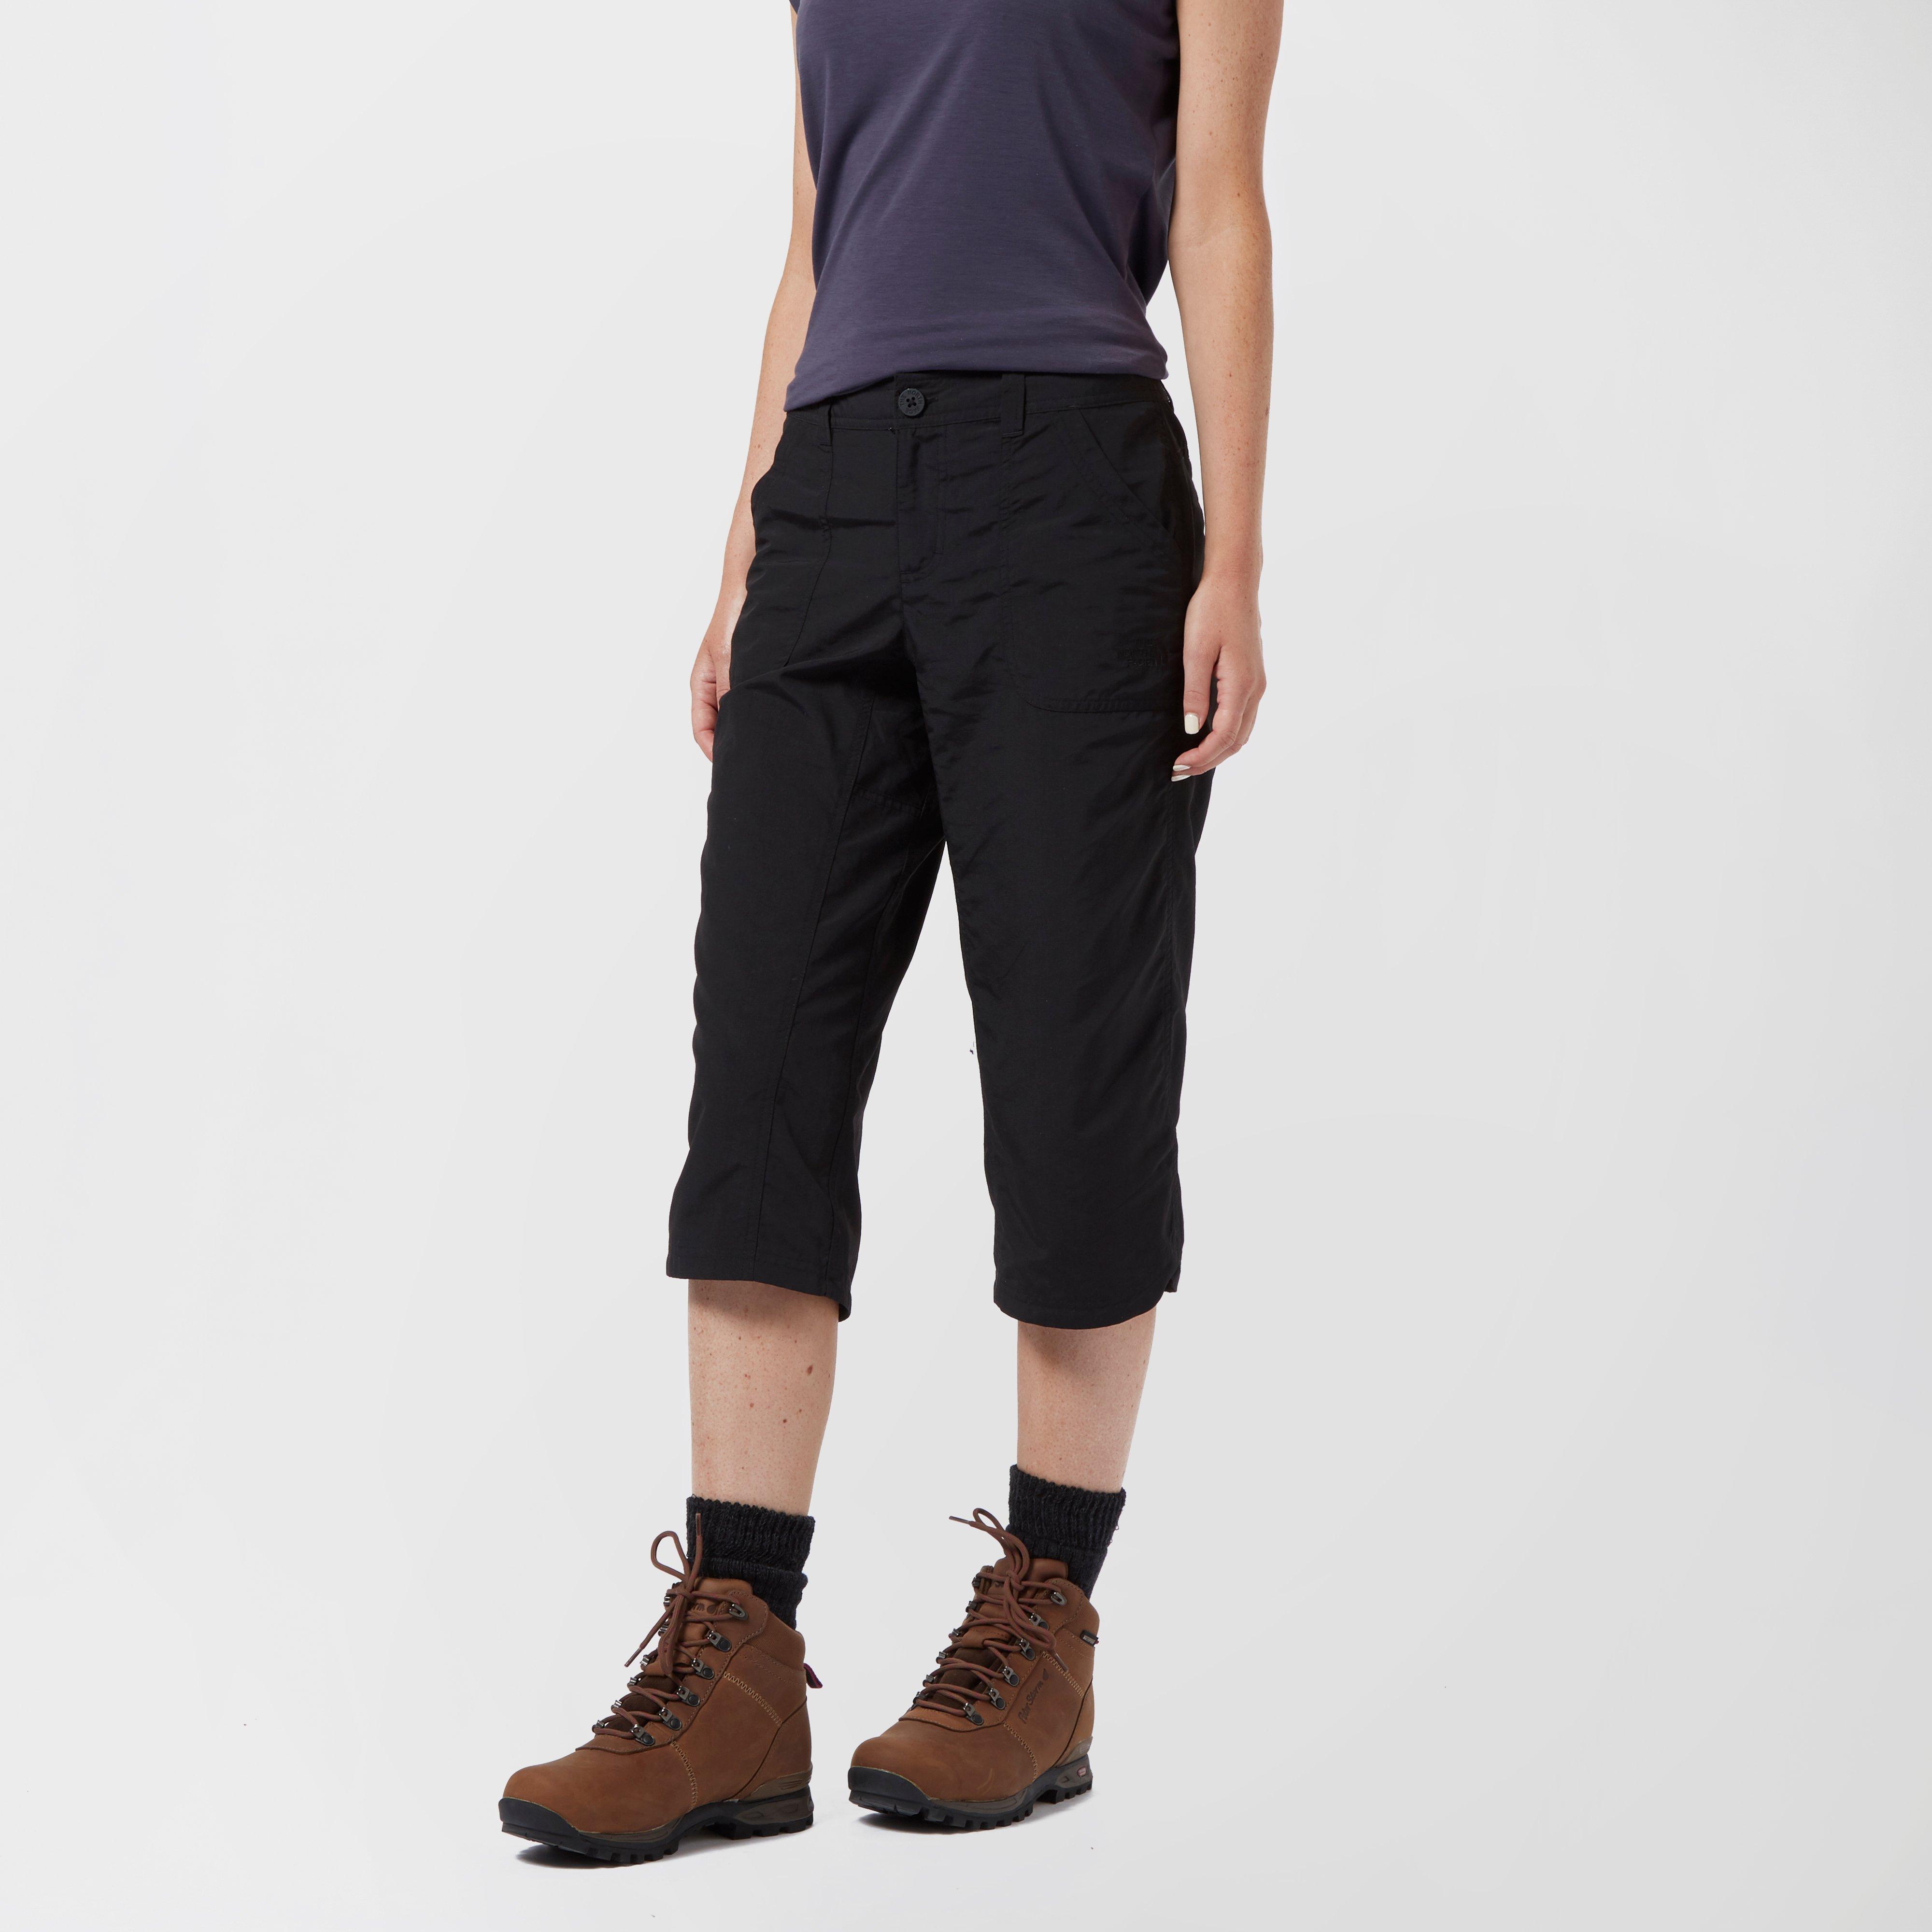 The North Face Womens Horizon Betty Capri Shorts Black